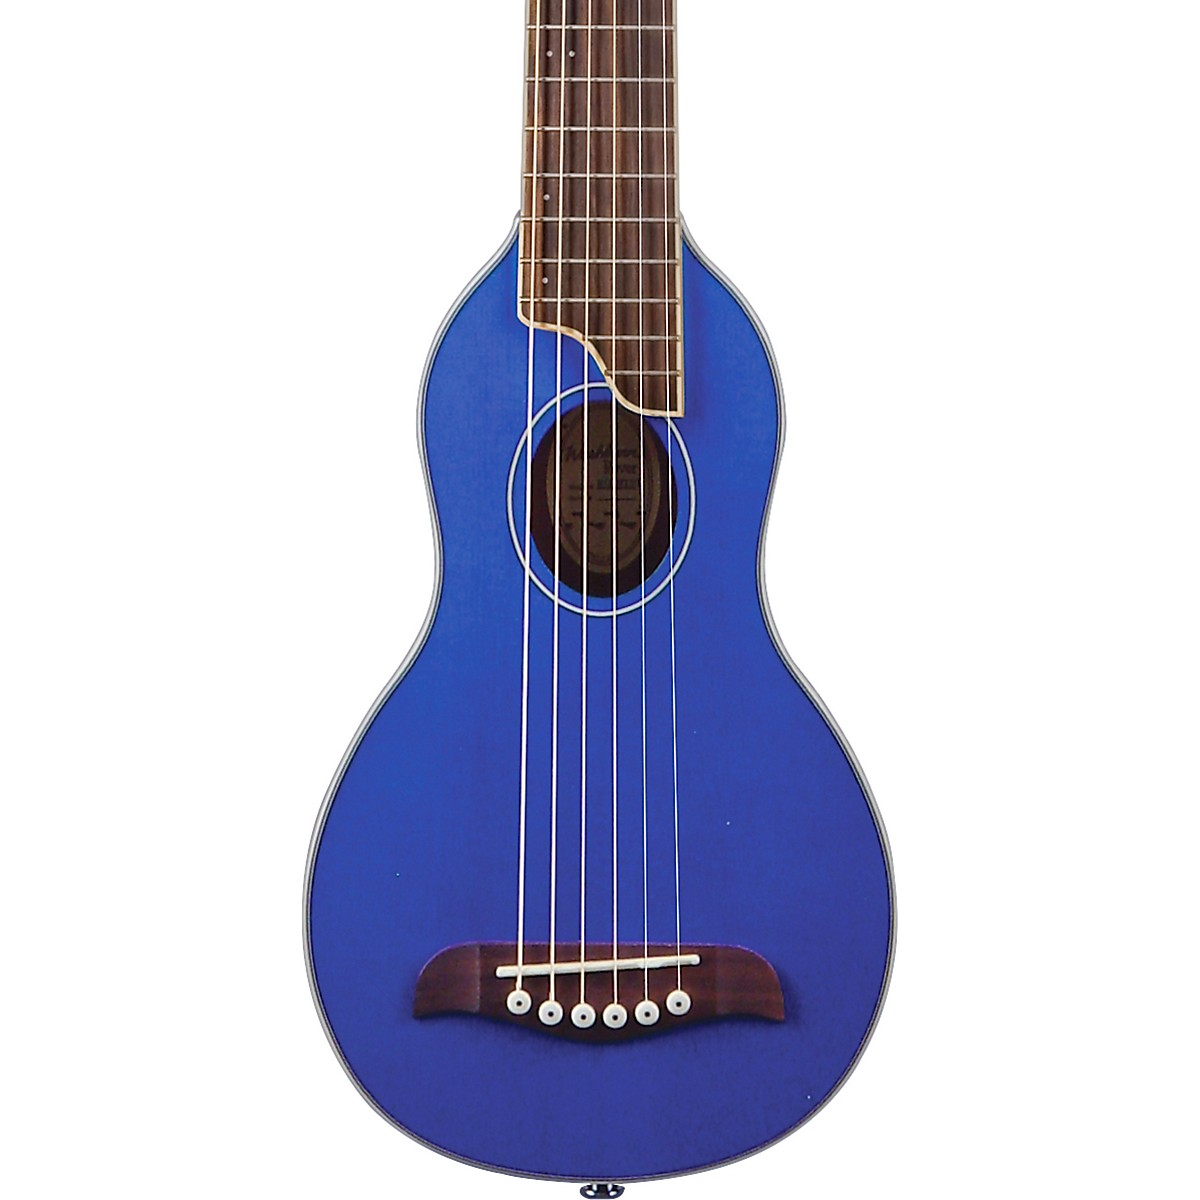 Washburn RO10 Rover Travel Acoustic Guitar